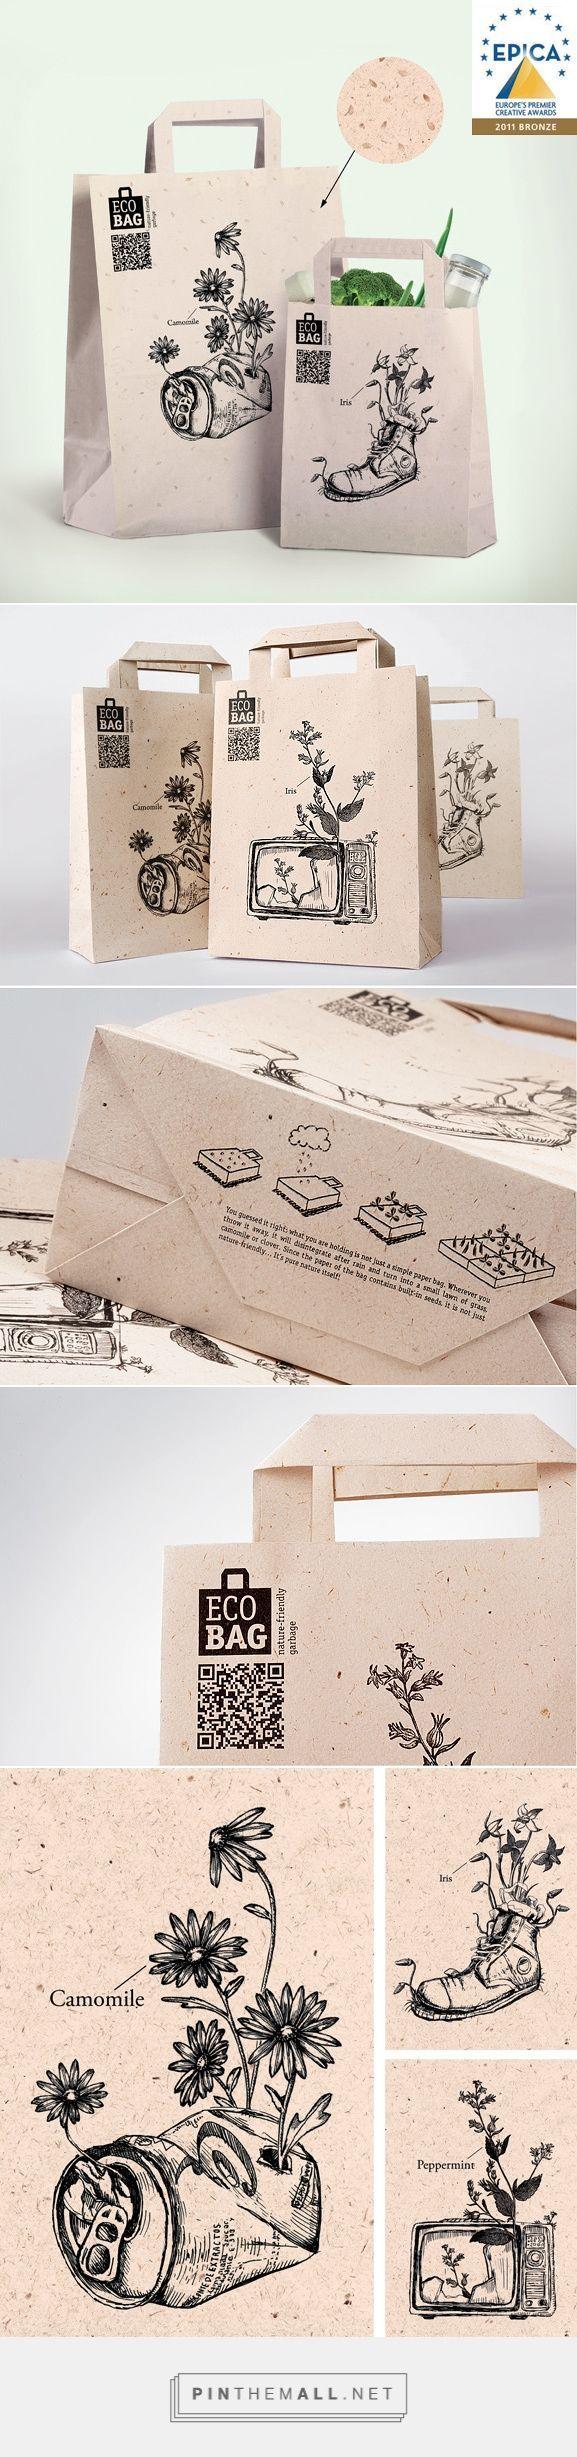 eco-packaging, inspiration ! #packaging #ecolo #ecologique  - margauxduprat.com -